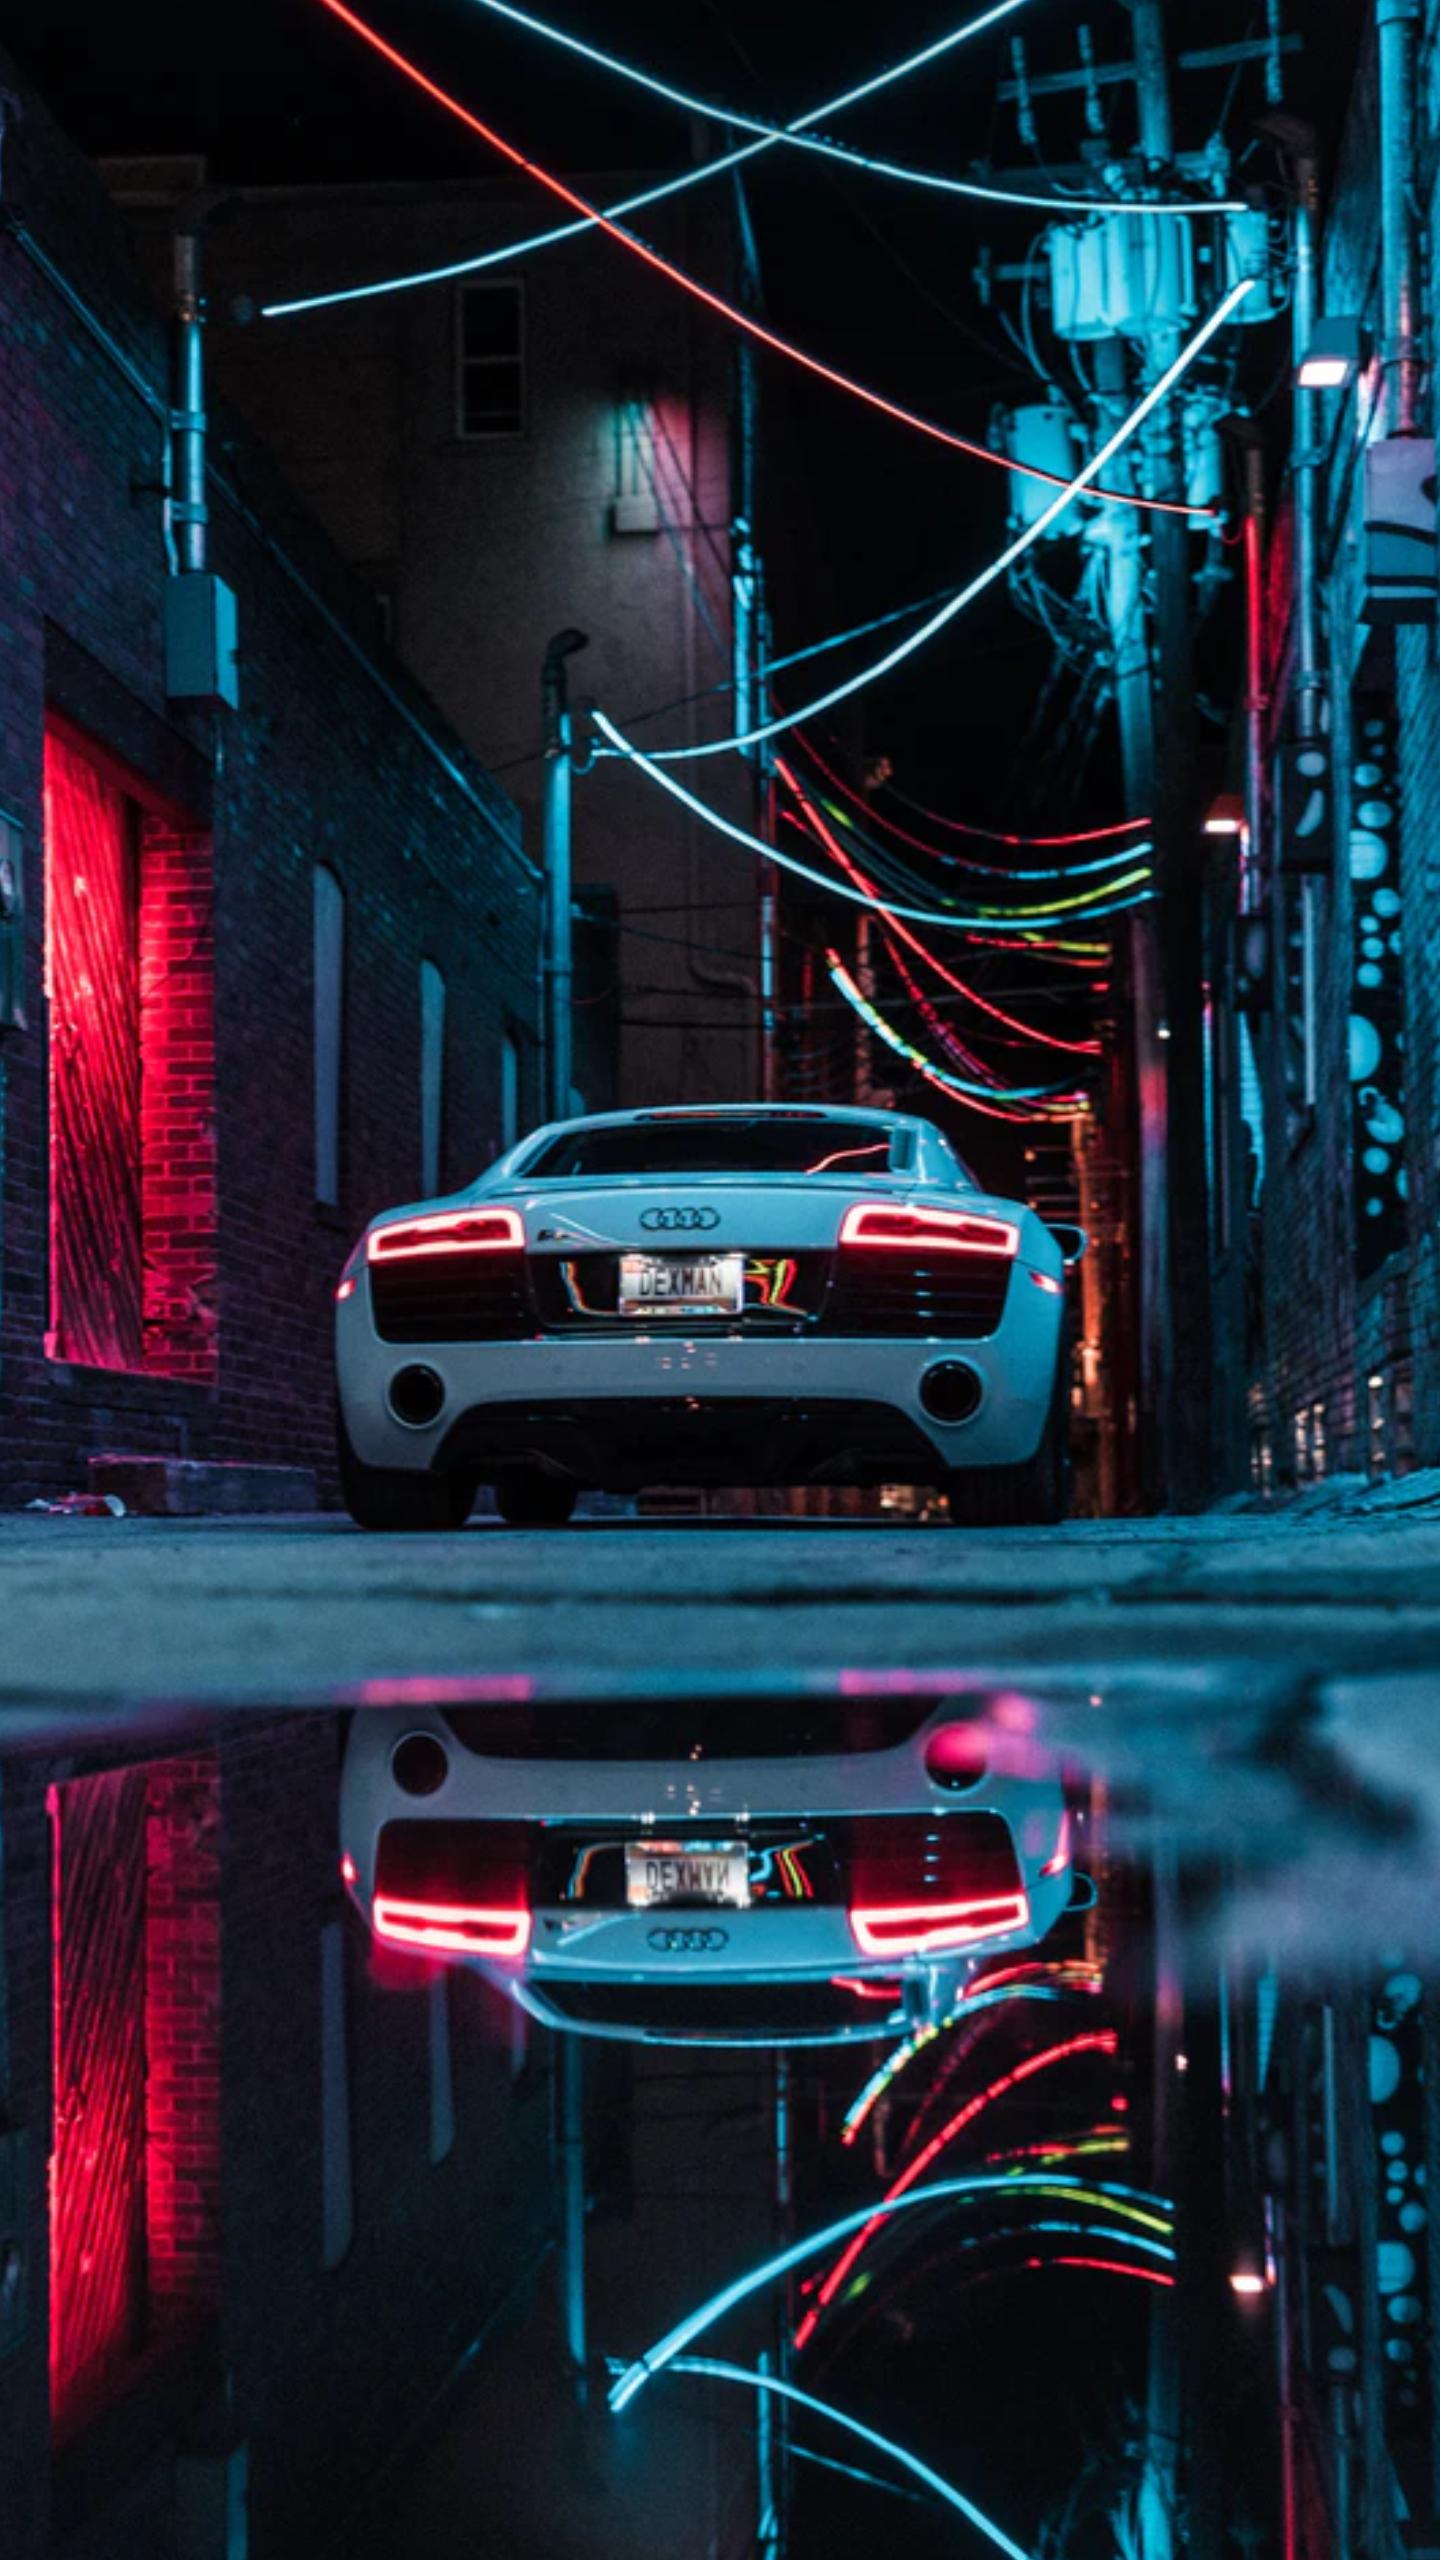 Fondo De Pantalla Audi R8 In 2021 Sports Car Wallpaper Neon Car Audi